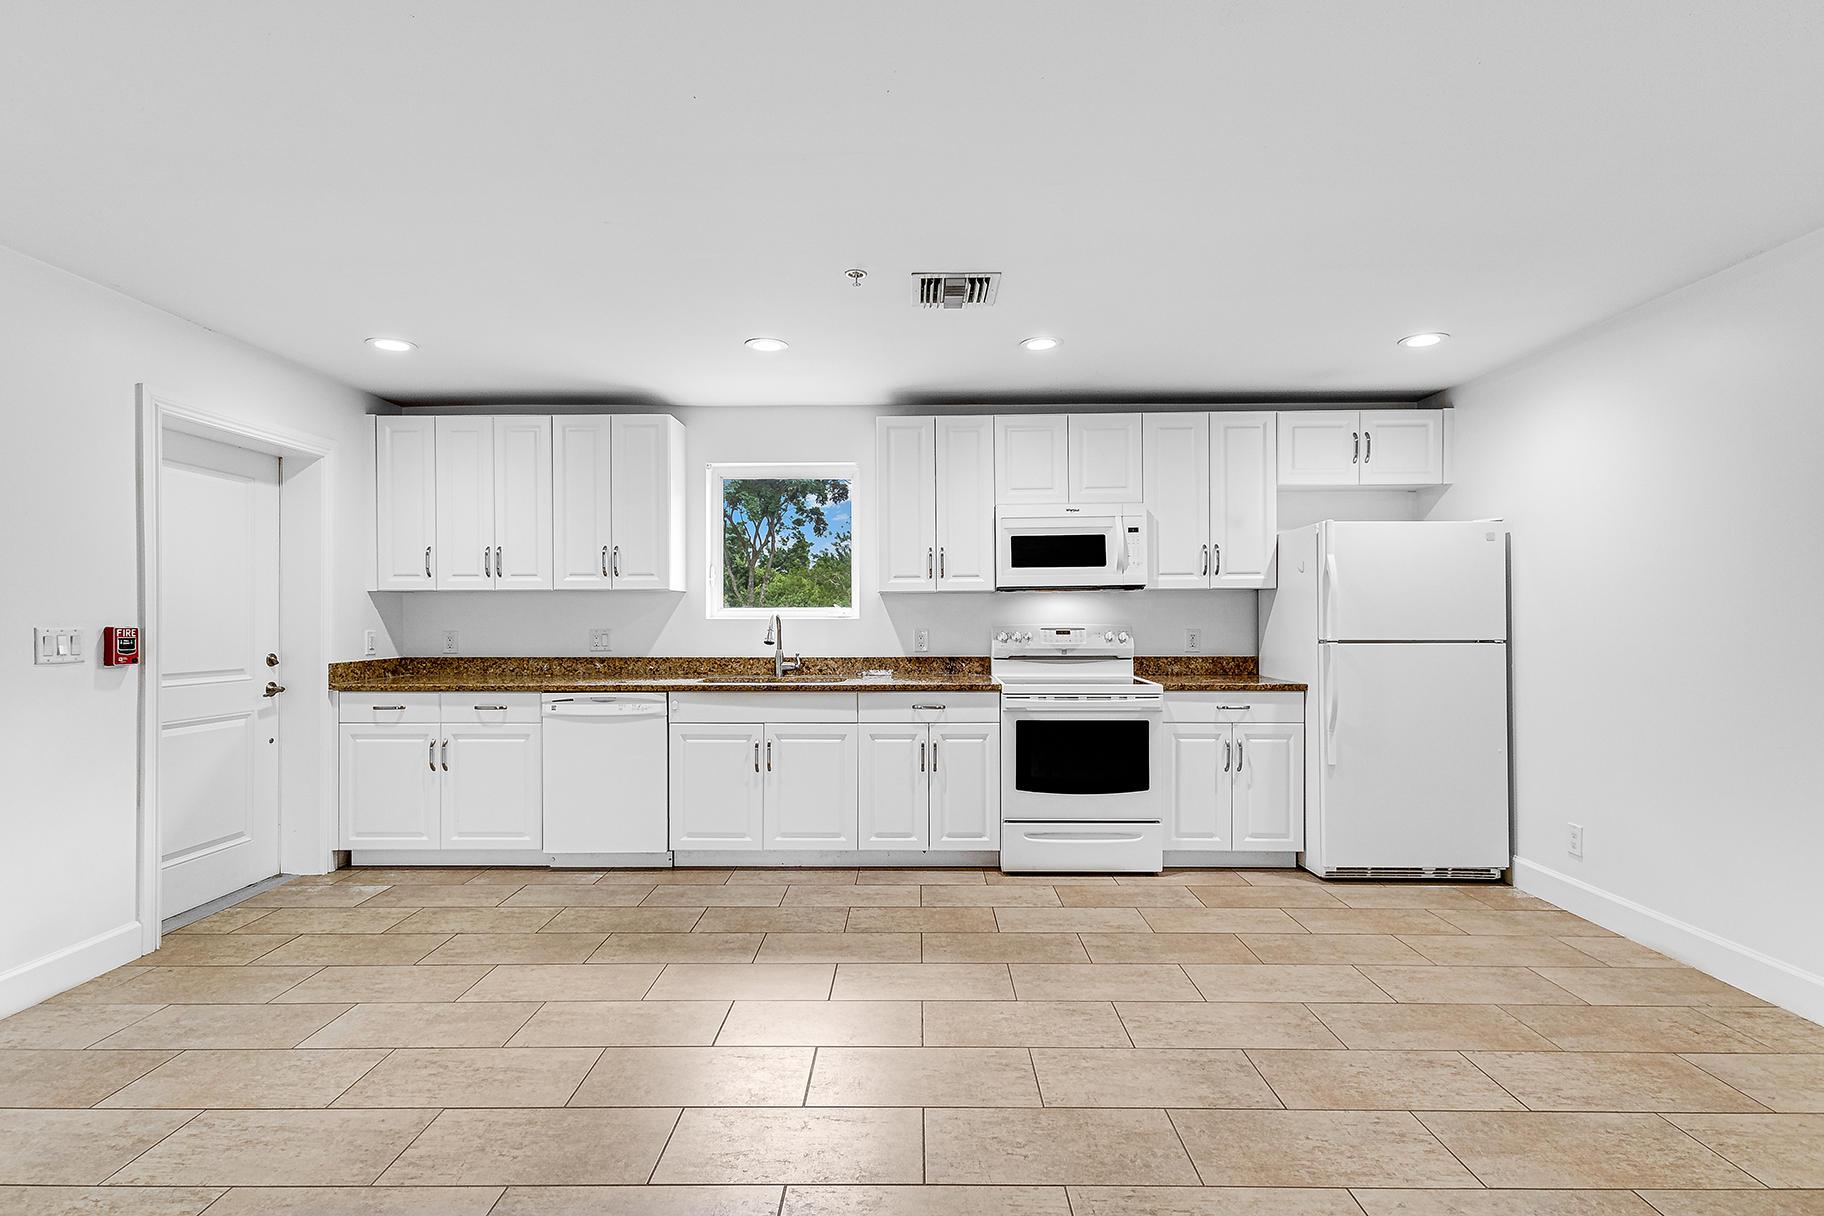 Groom's Quarters/Kitchen